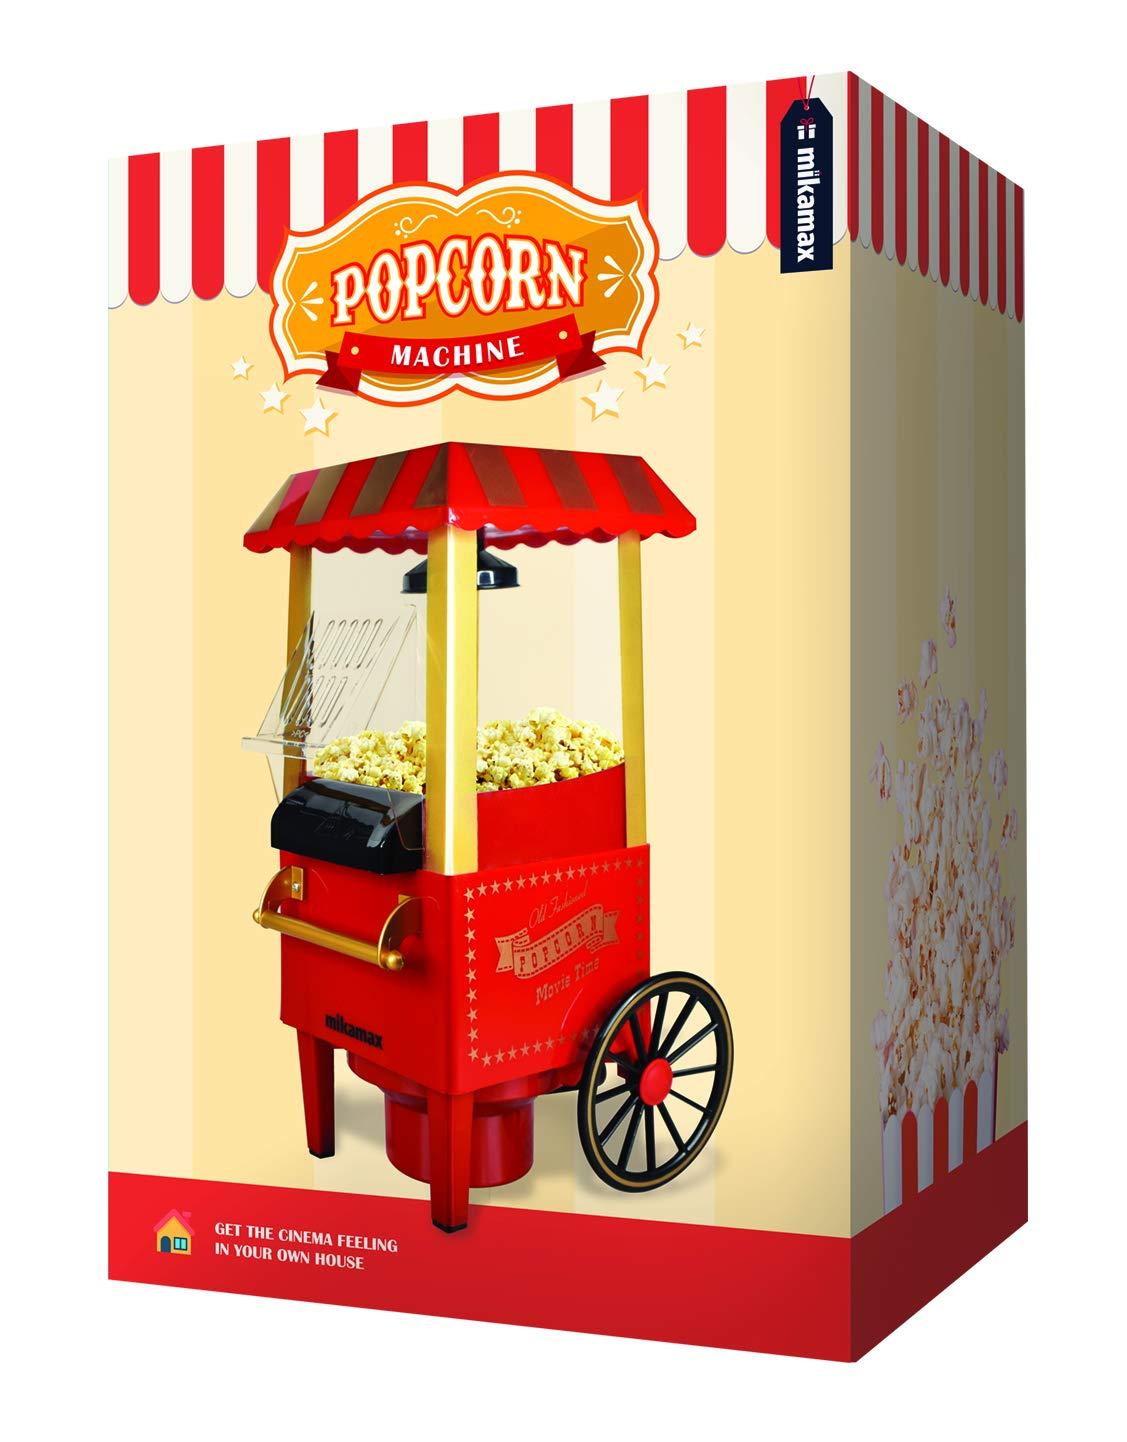 MikaMax - Popcorn Machine - Retro Palomitero Pop Corn Maker: Amazon.es: Electrónica